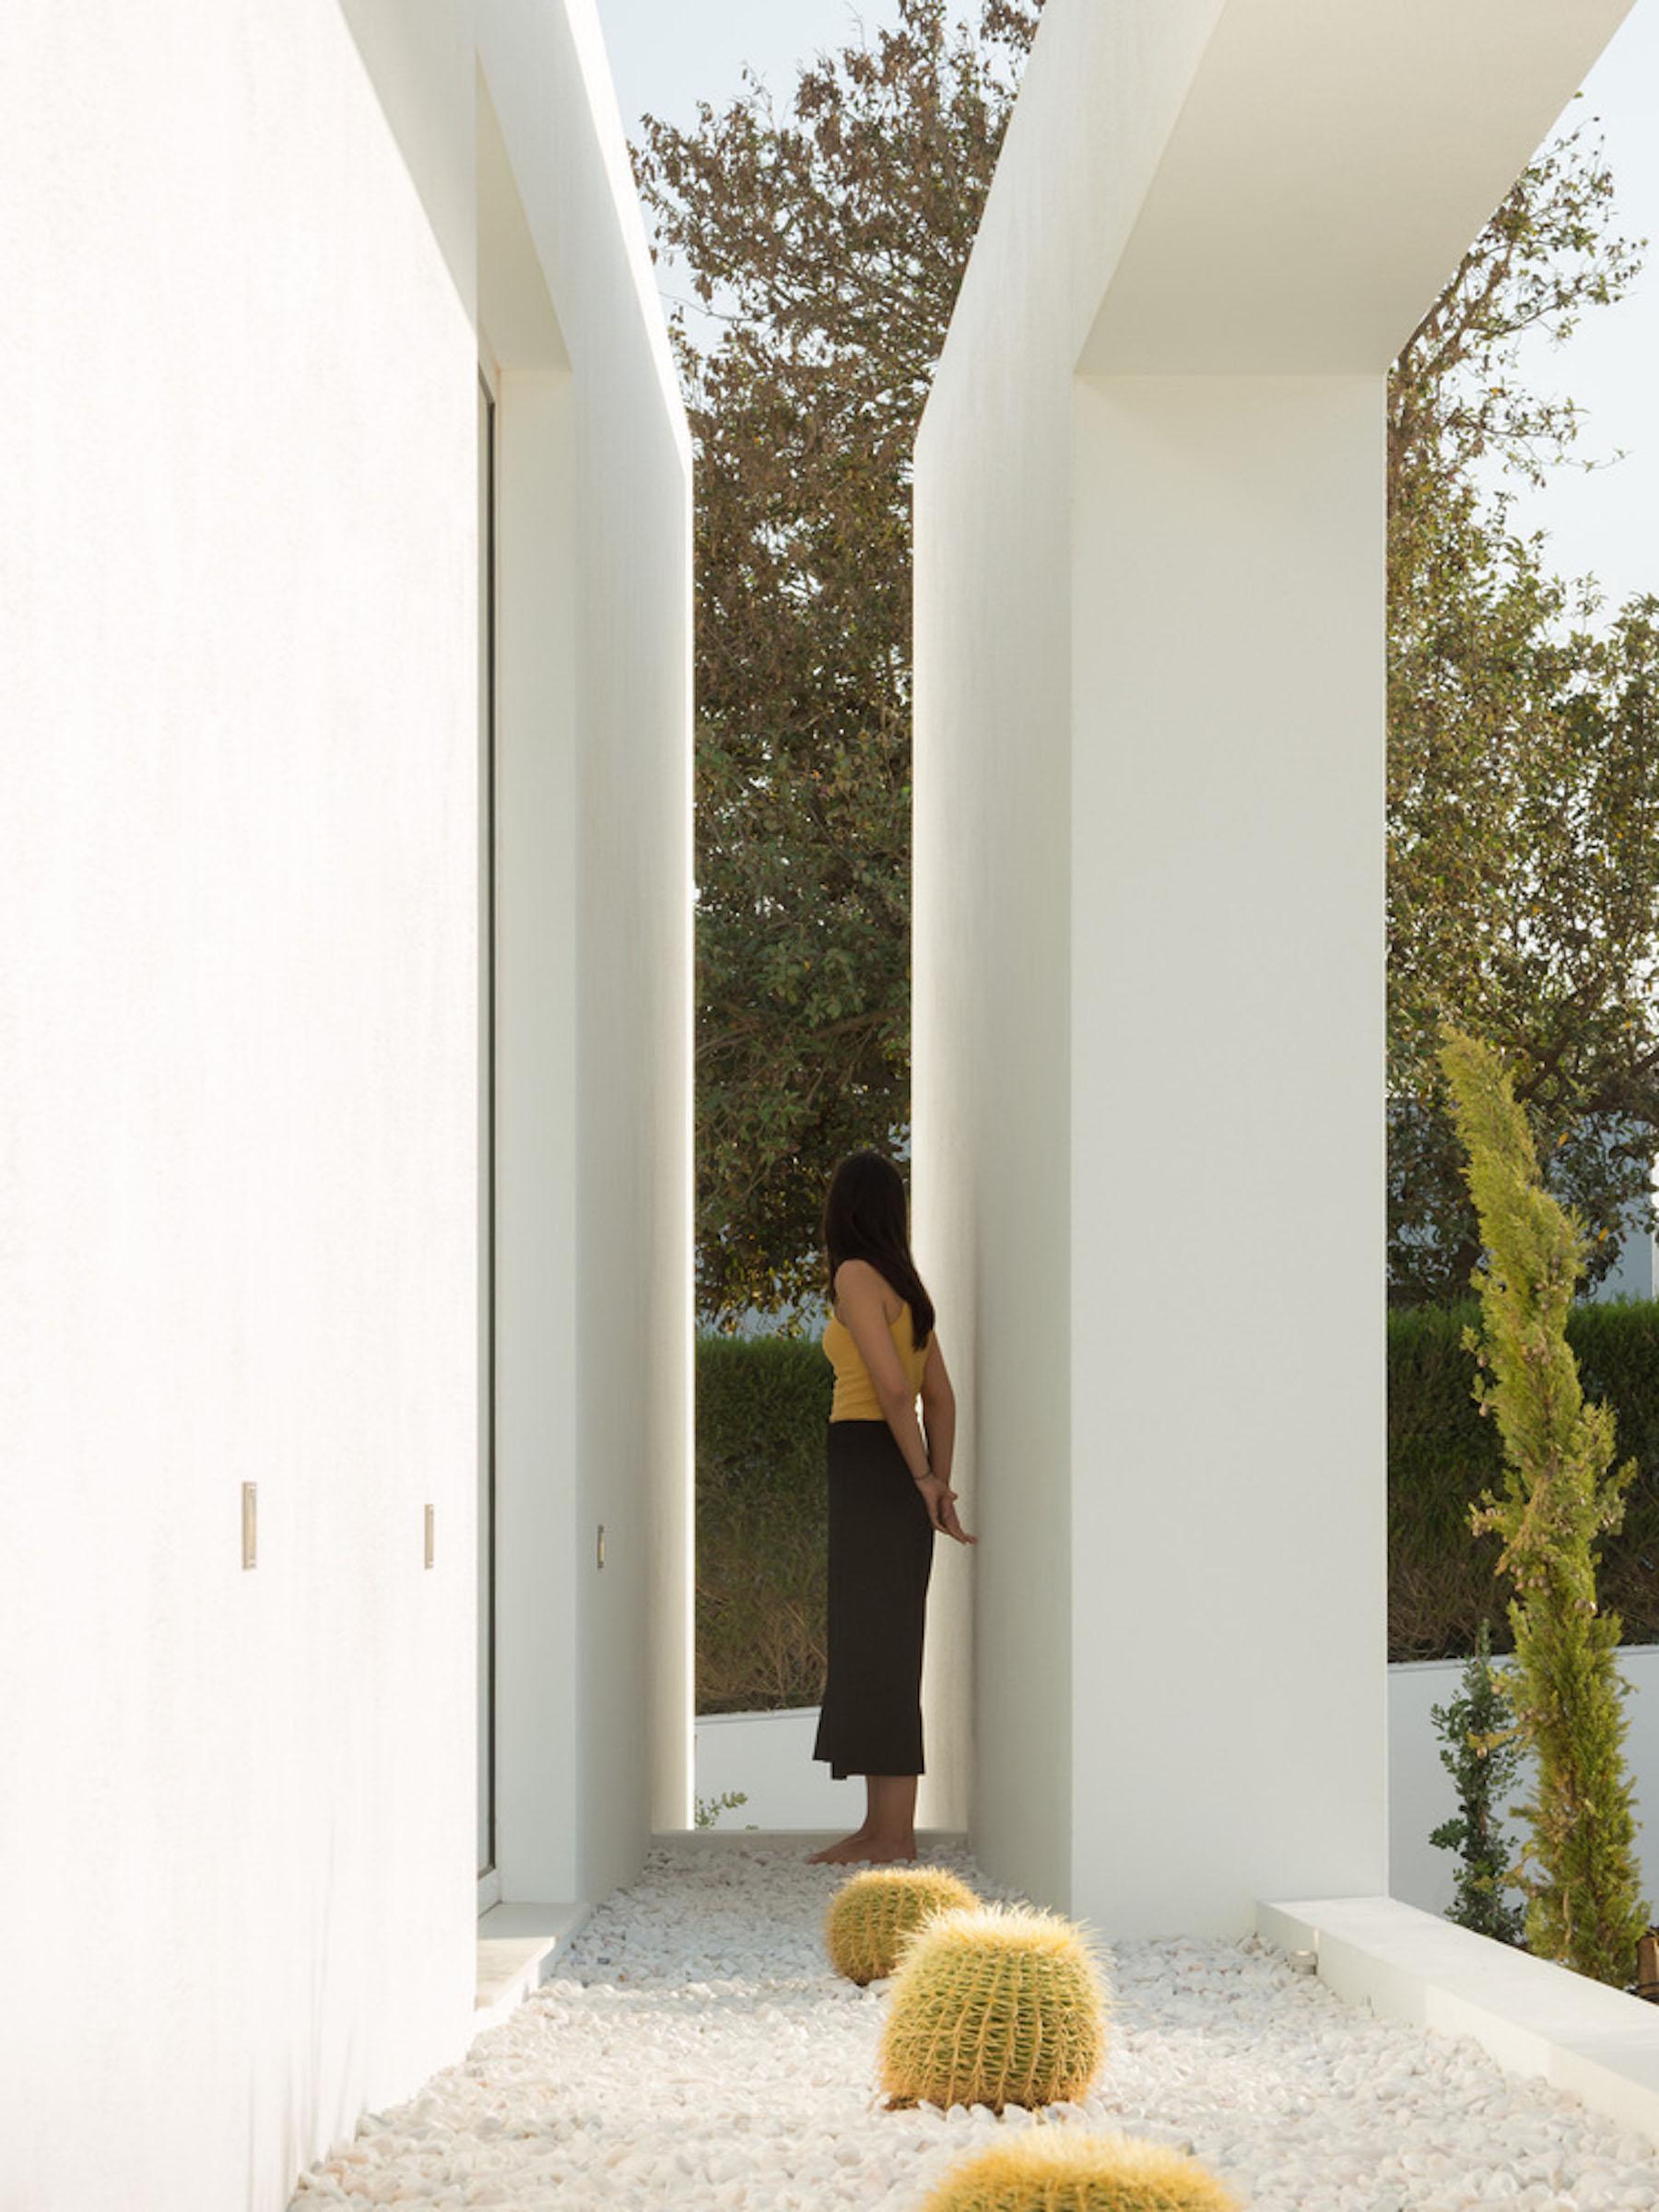 iGNANT-Architecture-Mário-Martins-Atelier-Casa-Carrara-17